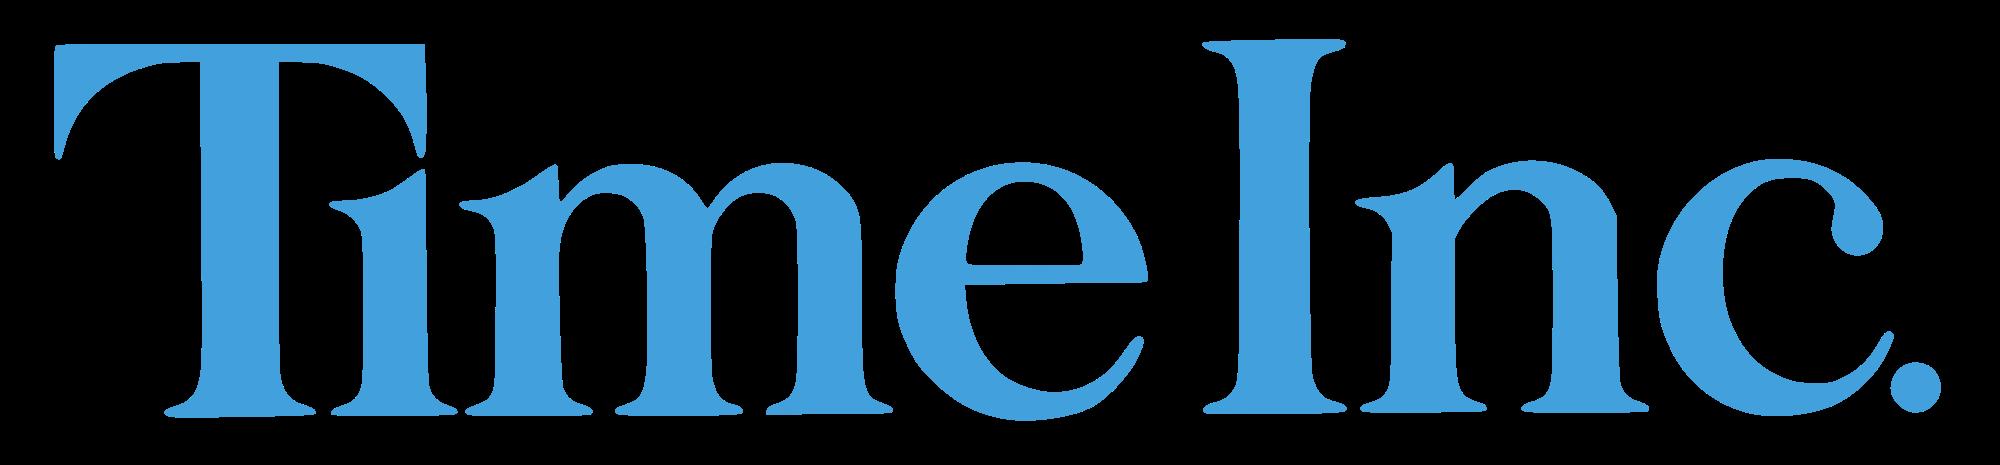 time inc logo.png